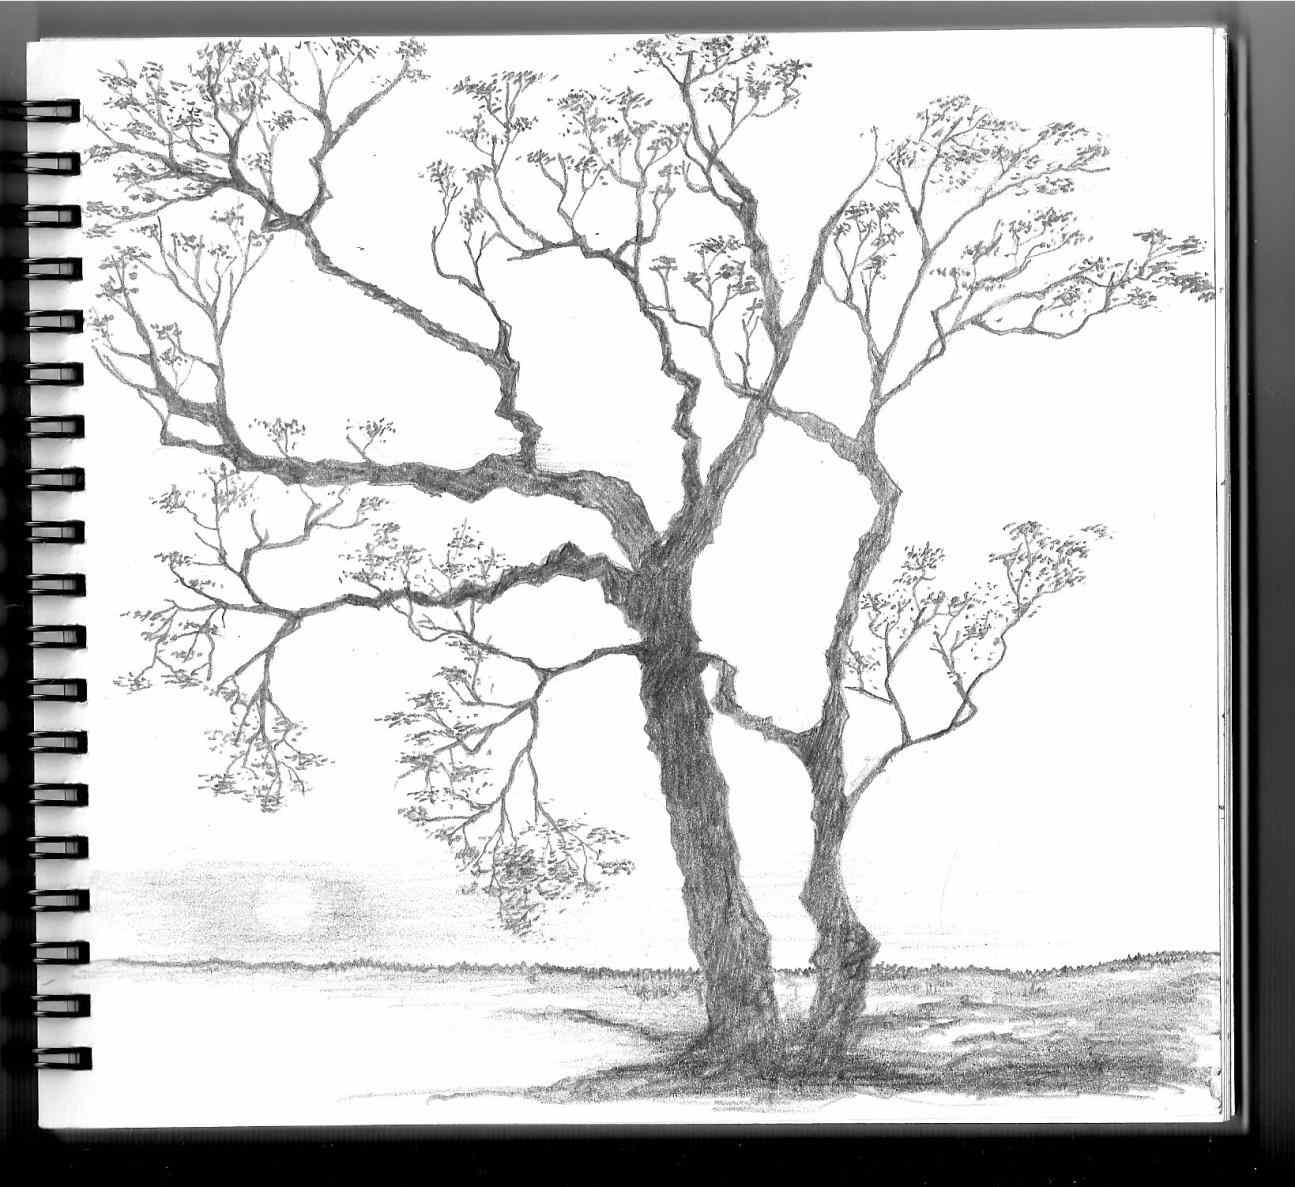 1295x1187 Sketch Spring Season Pencil Drawing For Of Repke Art Repke Spring